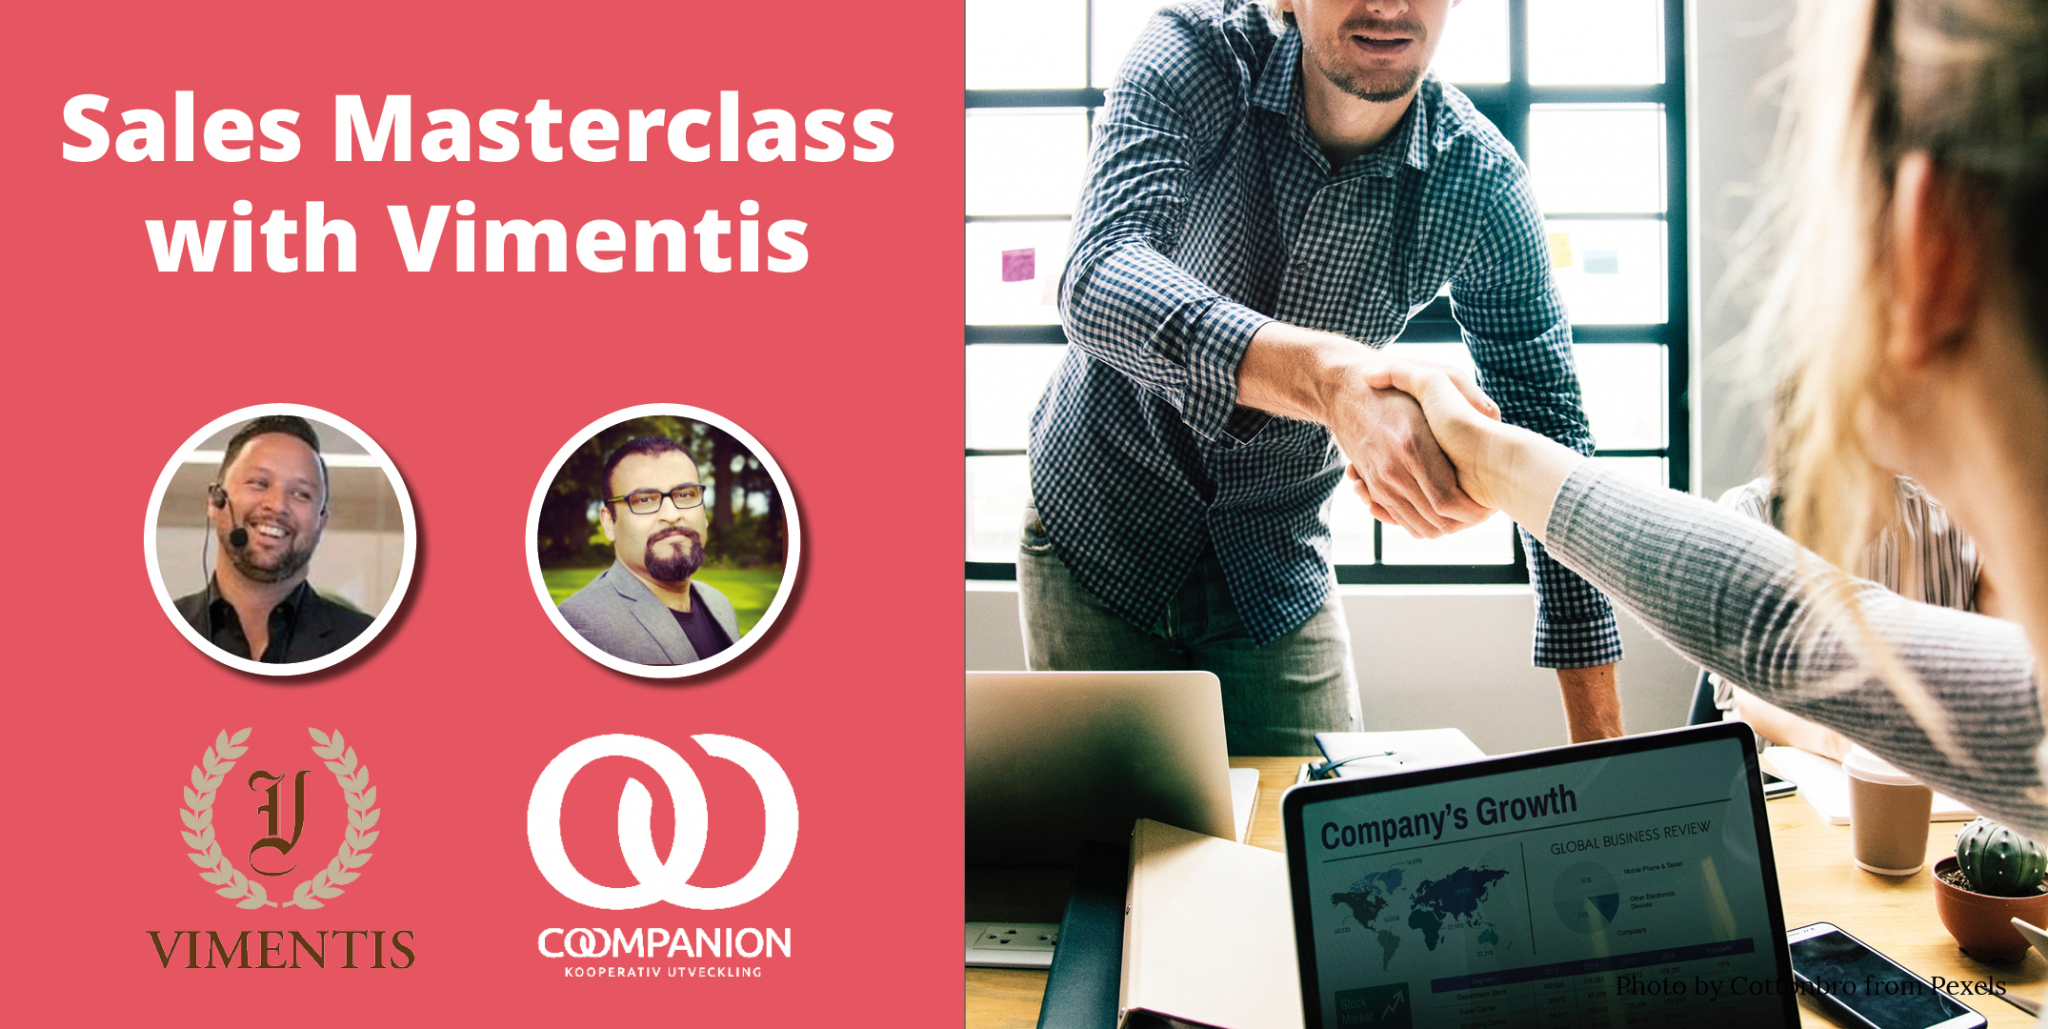 Sales Masterclass with Vimentis